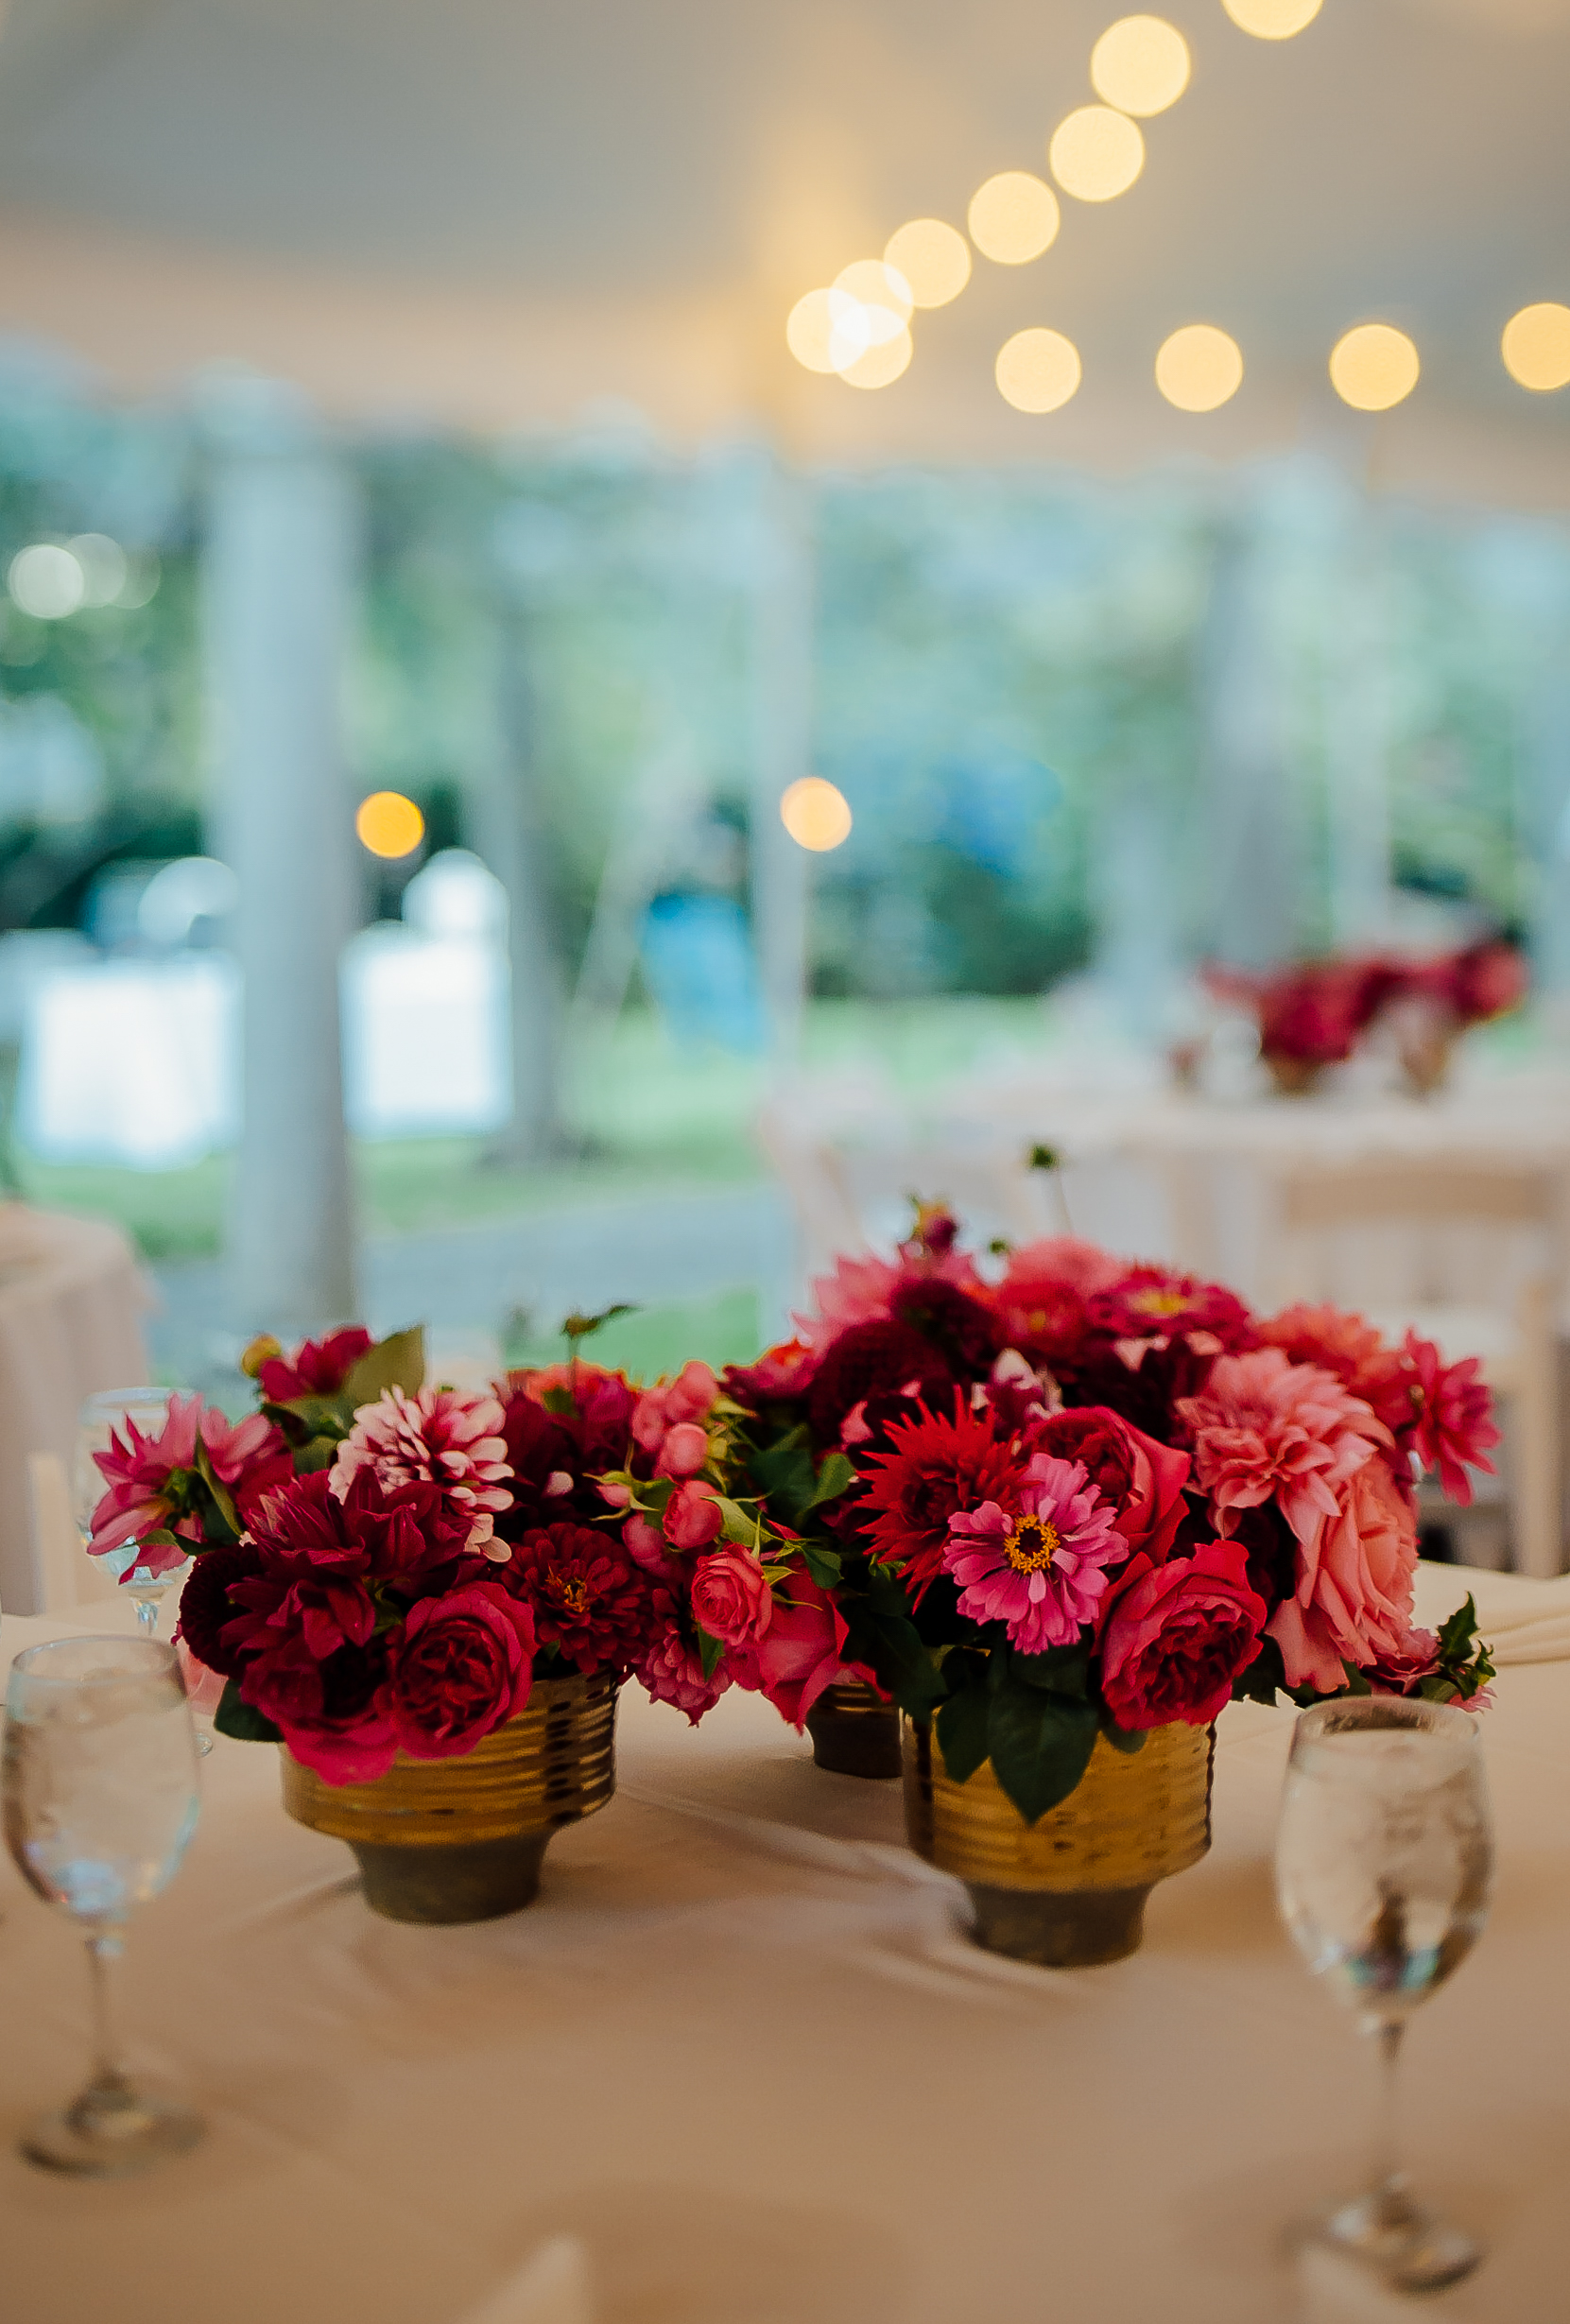 Tara Consolati is a luxury wedding planner in Lenox MA